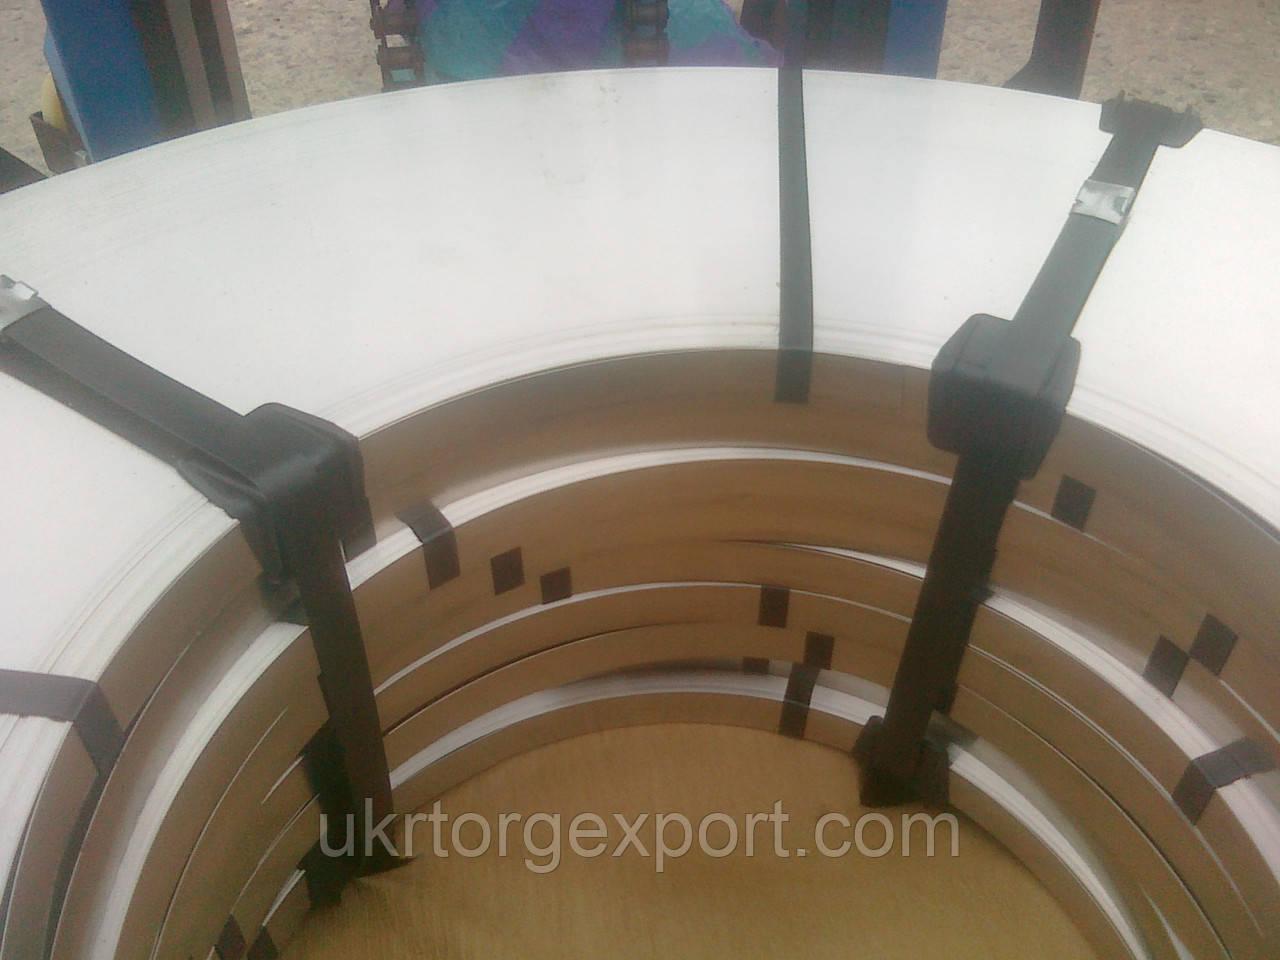 Лента фехраль Х23Ю5Т (OCr23Al5) 0,1*0,8 мм